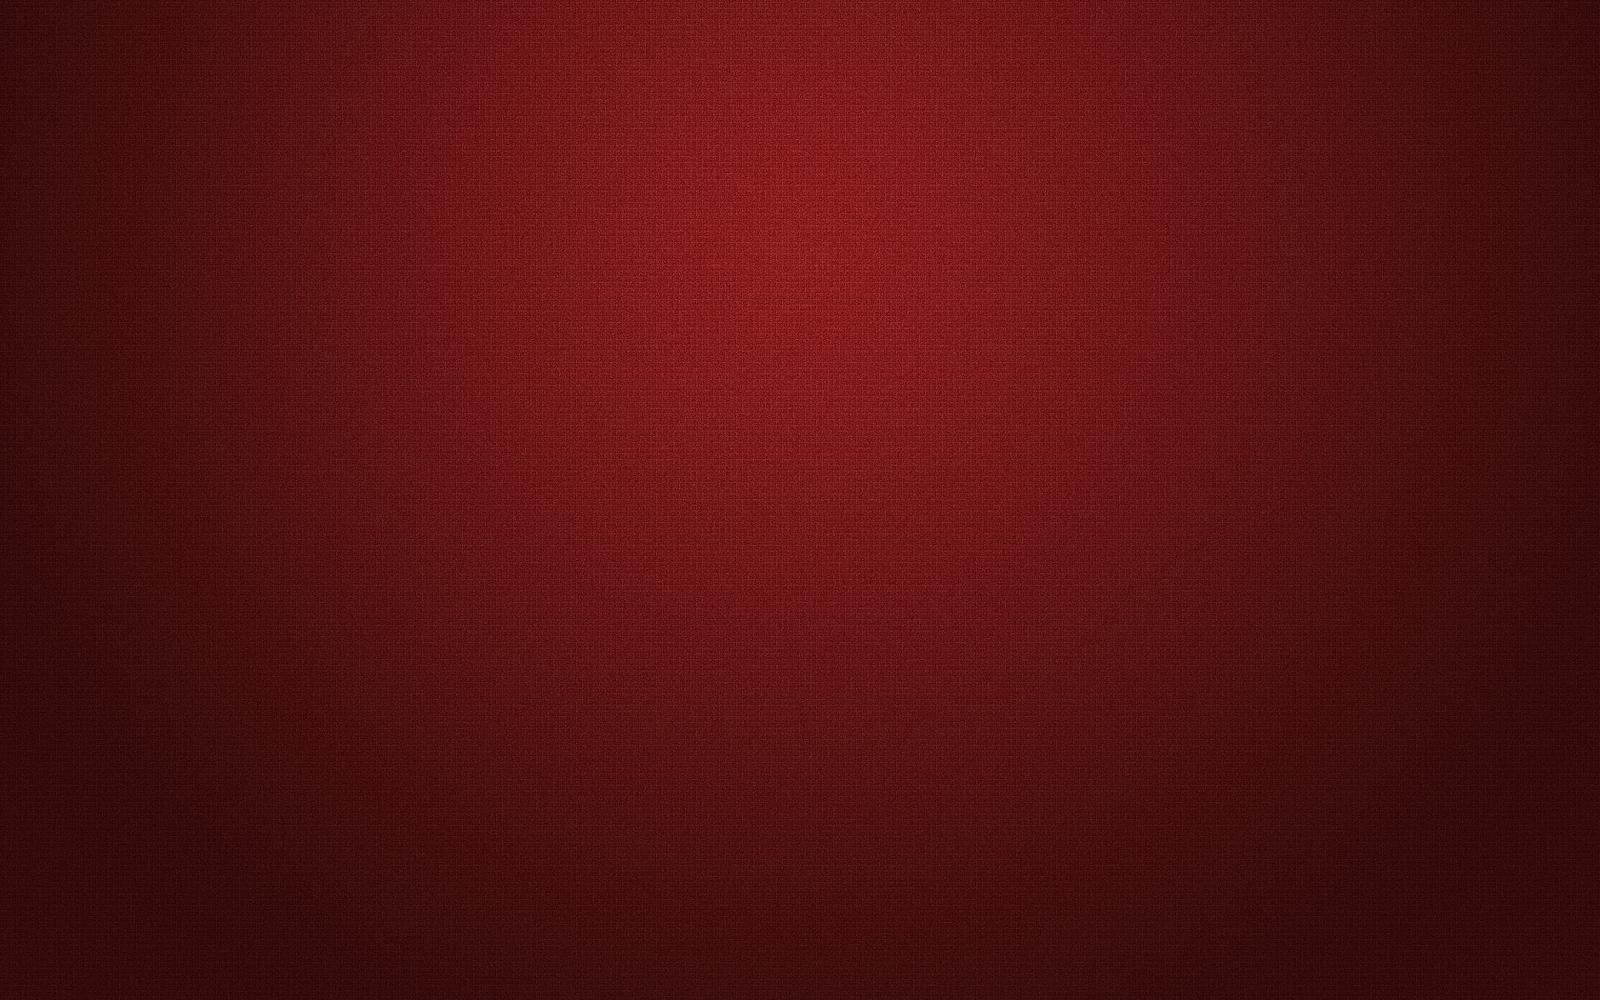 ... best-top-desktop-red-wallpapers-red-wallpaper-red-background-hd-26.jpg